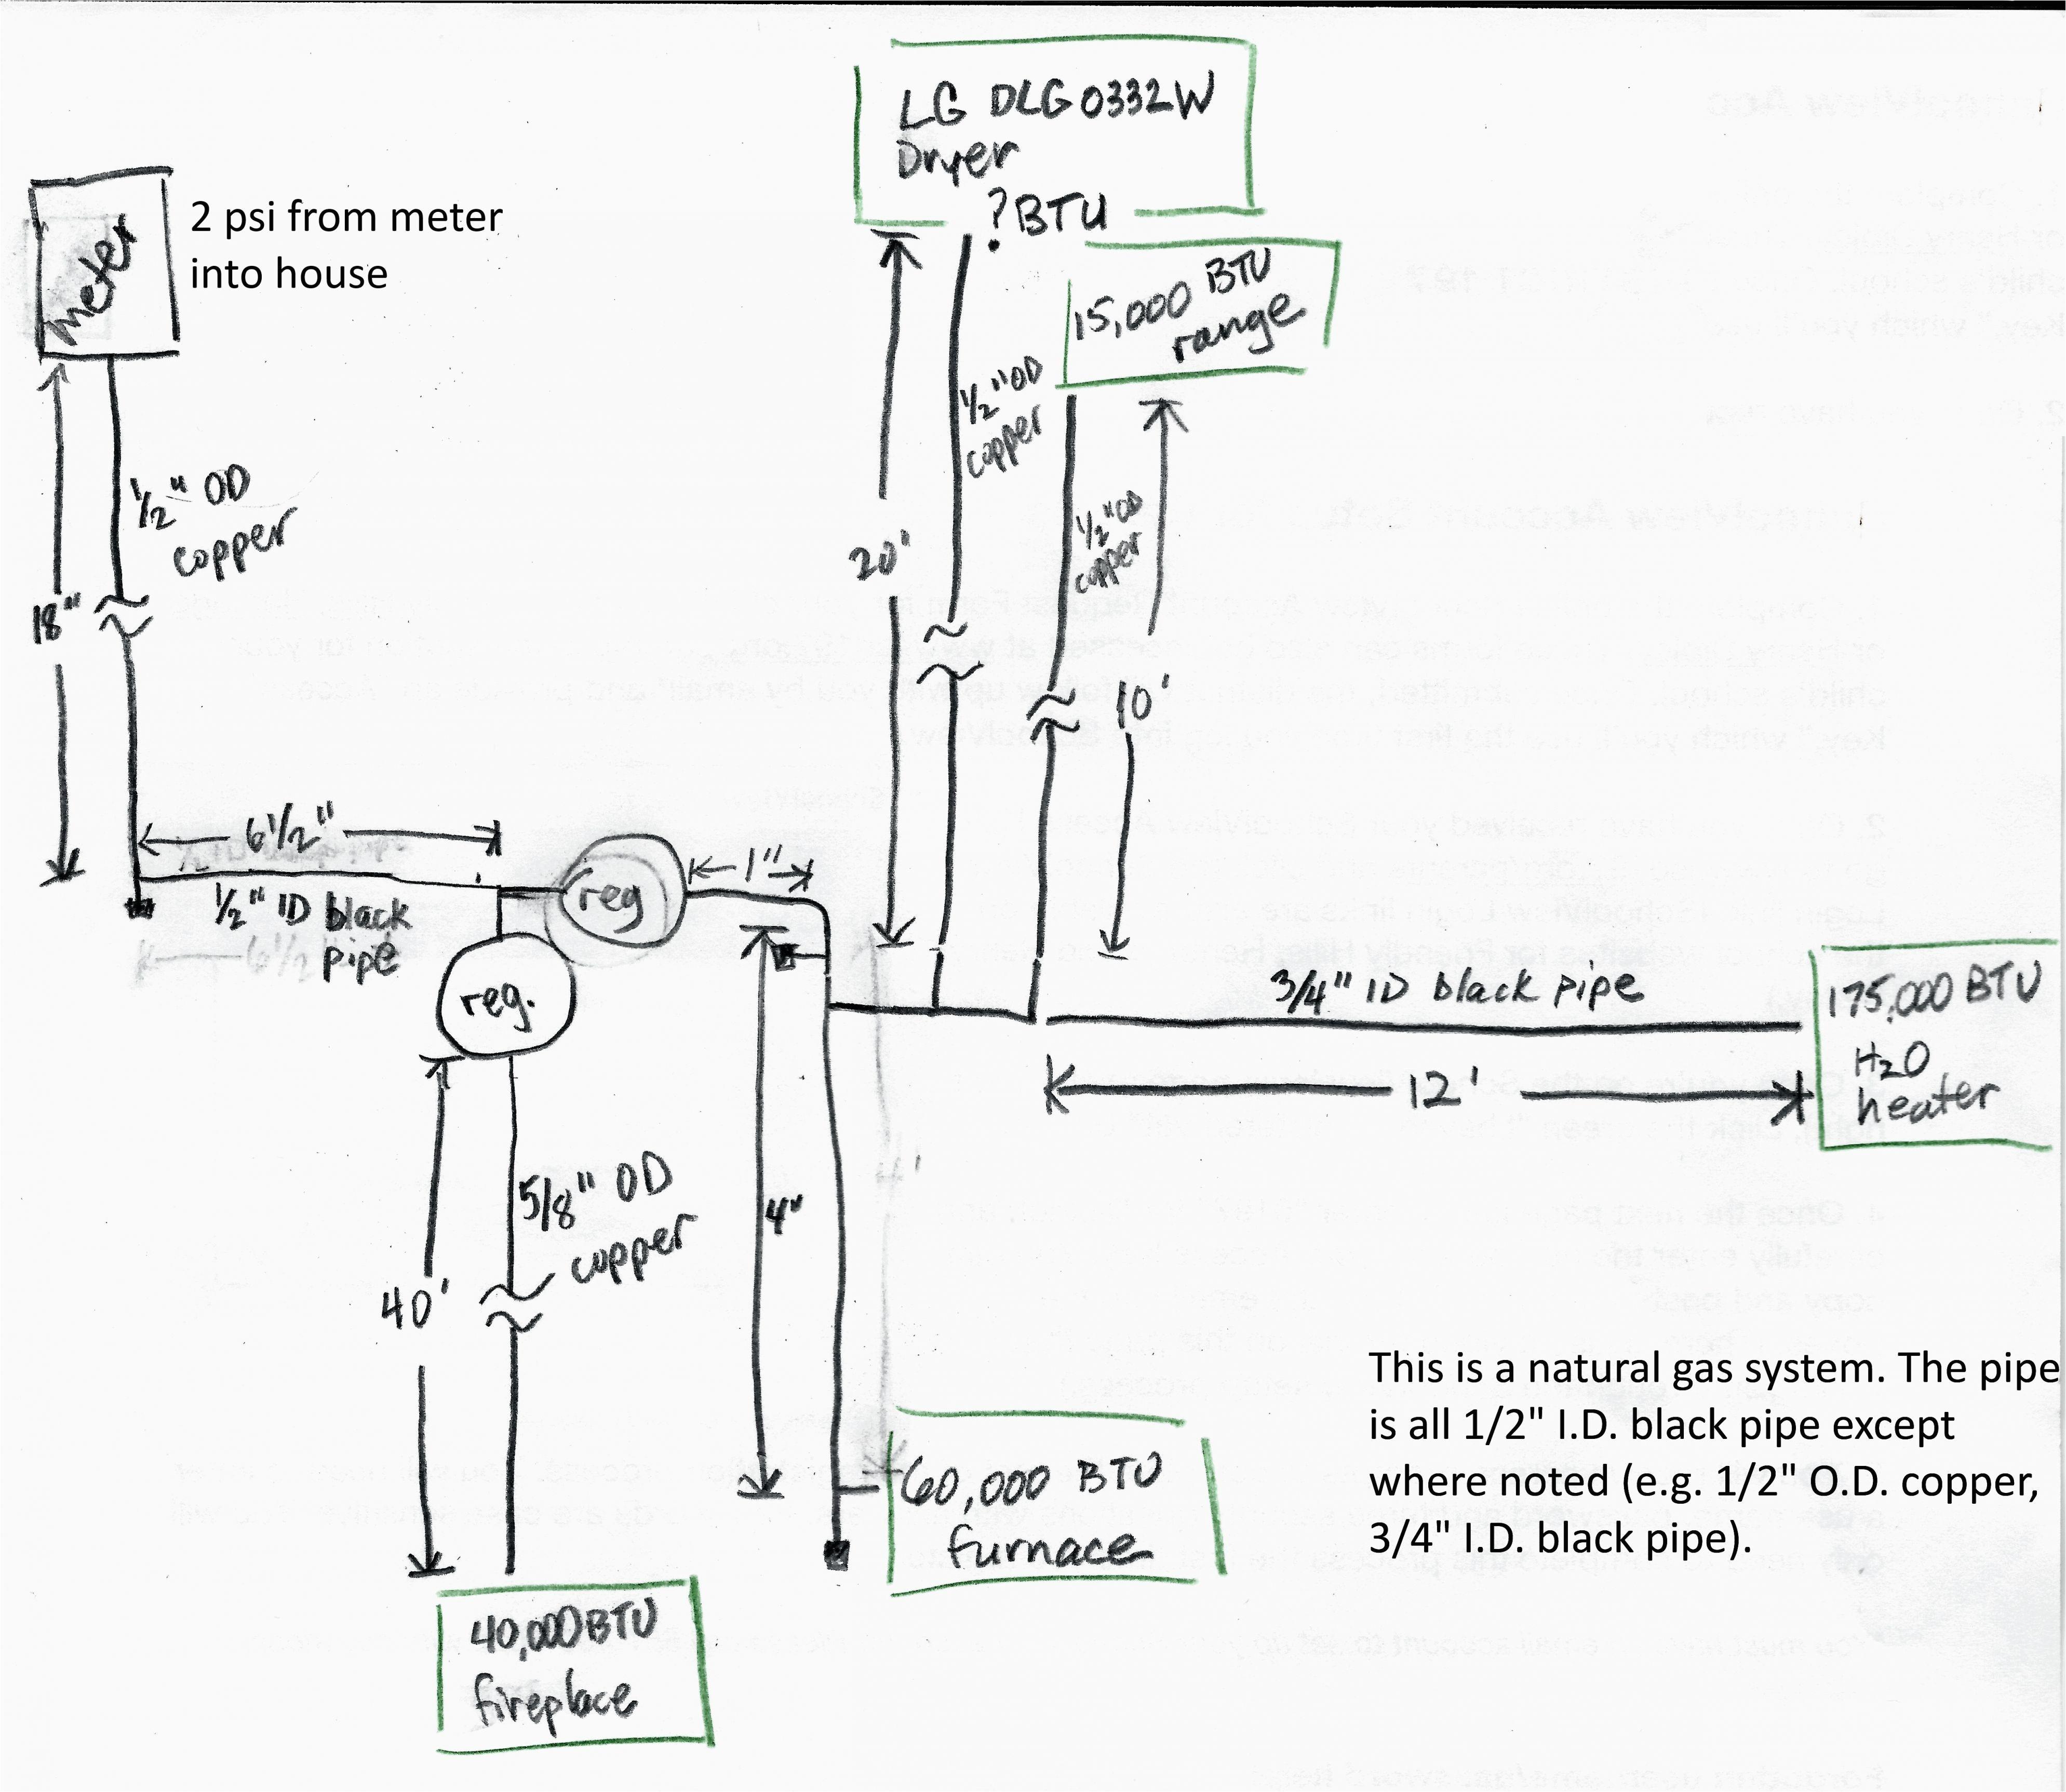 electric sub meter wiring diagram lovely fresh electrical meter box wiring diagram electrical outlet symbol